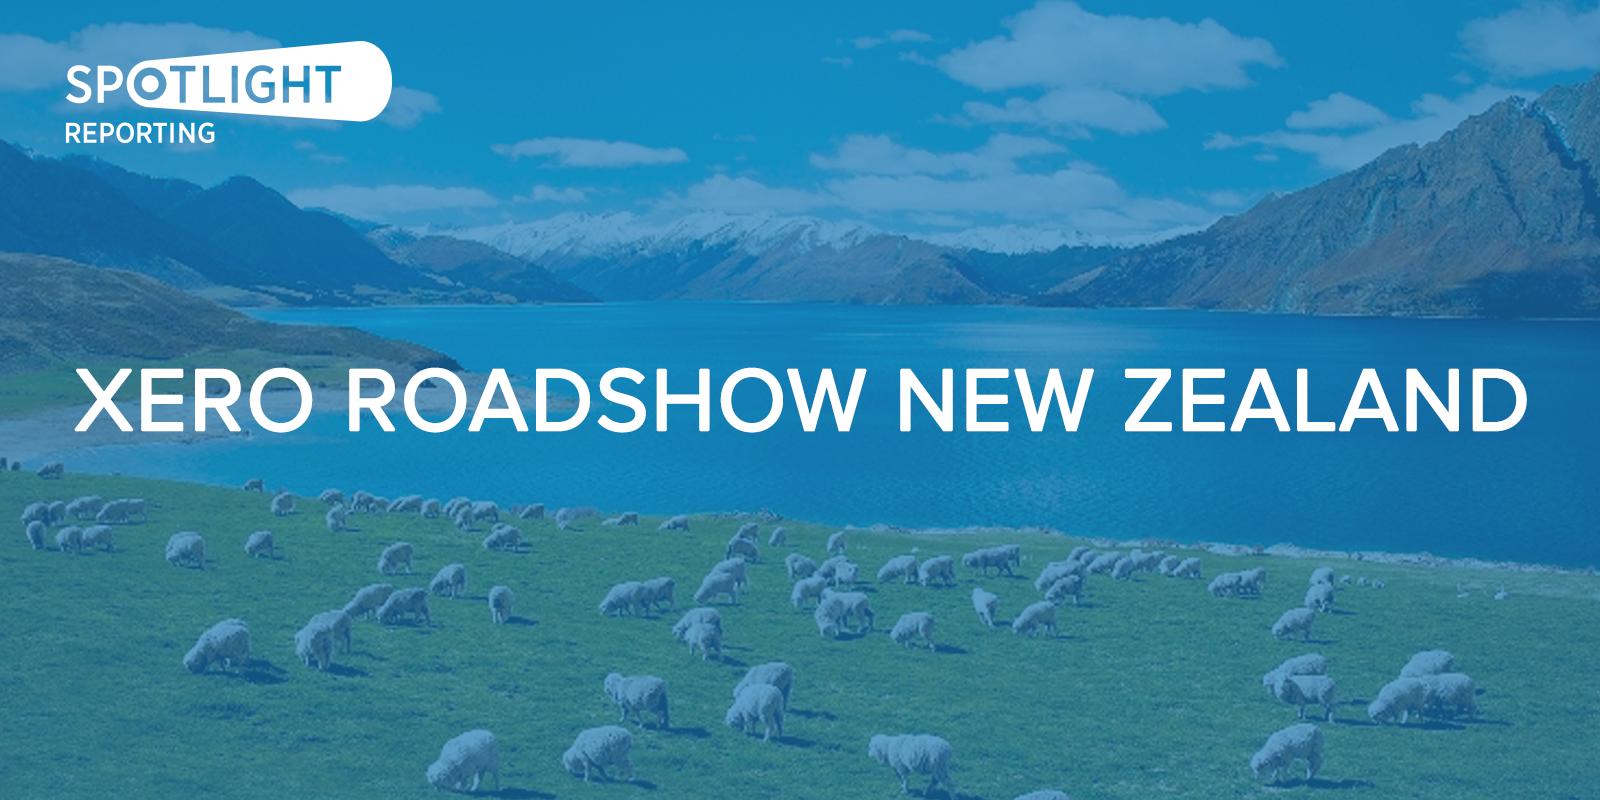 Xero_Roadshow_New_Zealand_2016_Auckland_Wellington_Christchurch_Queenstown_Hamilton.png